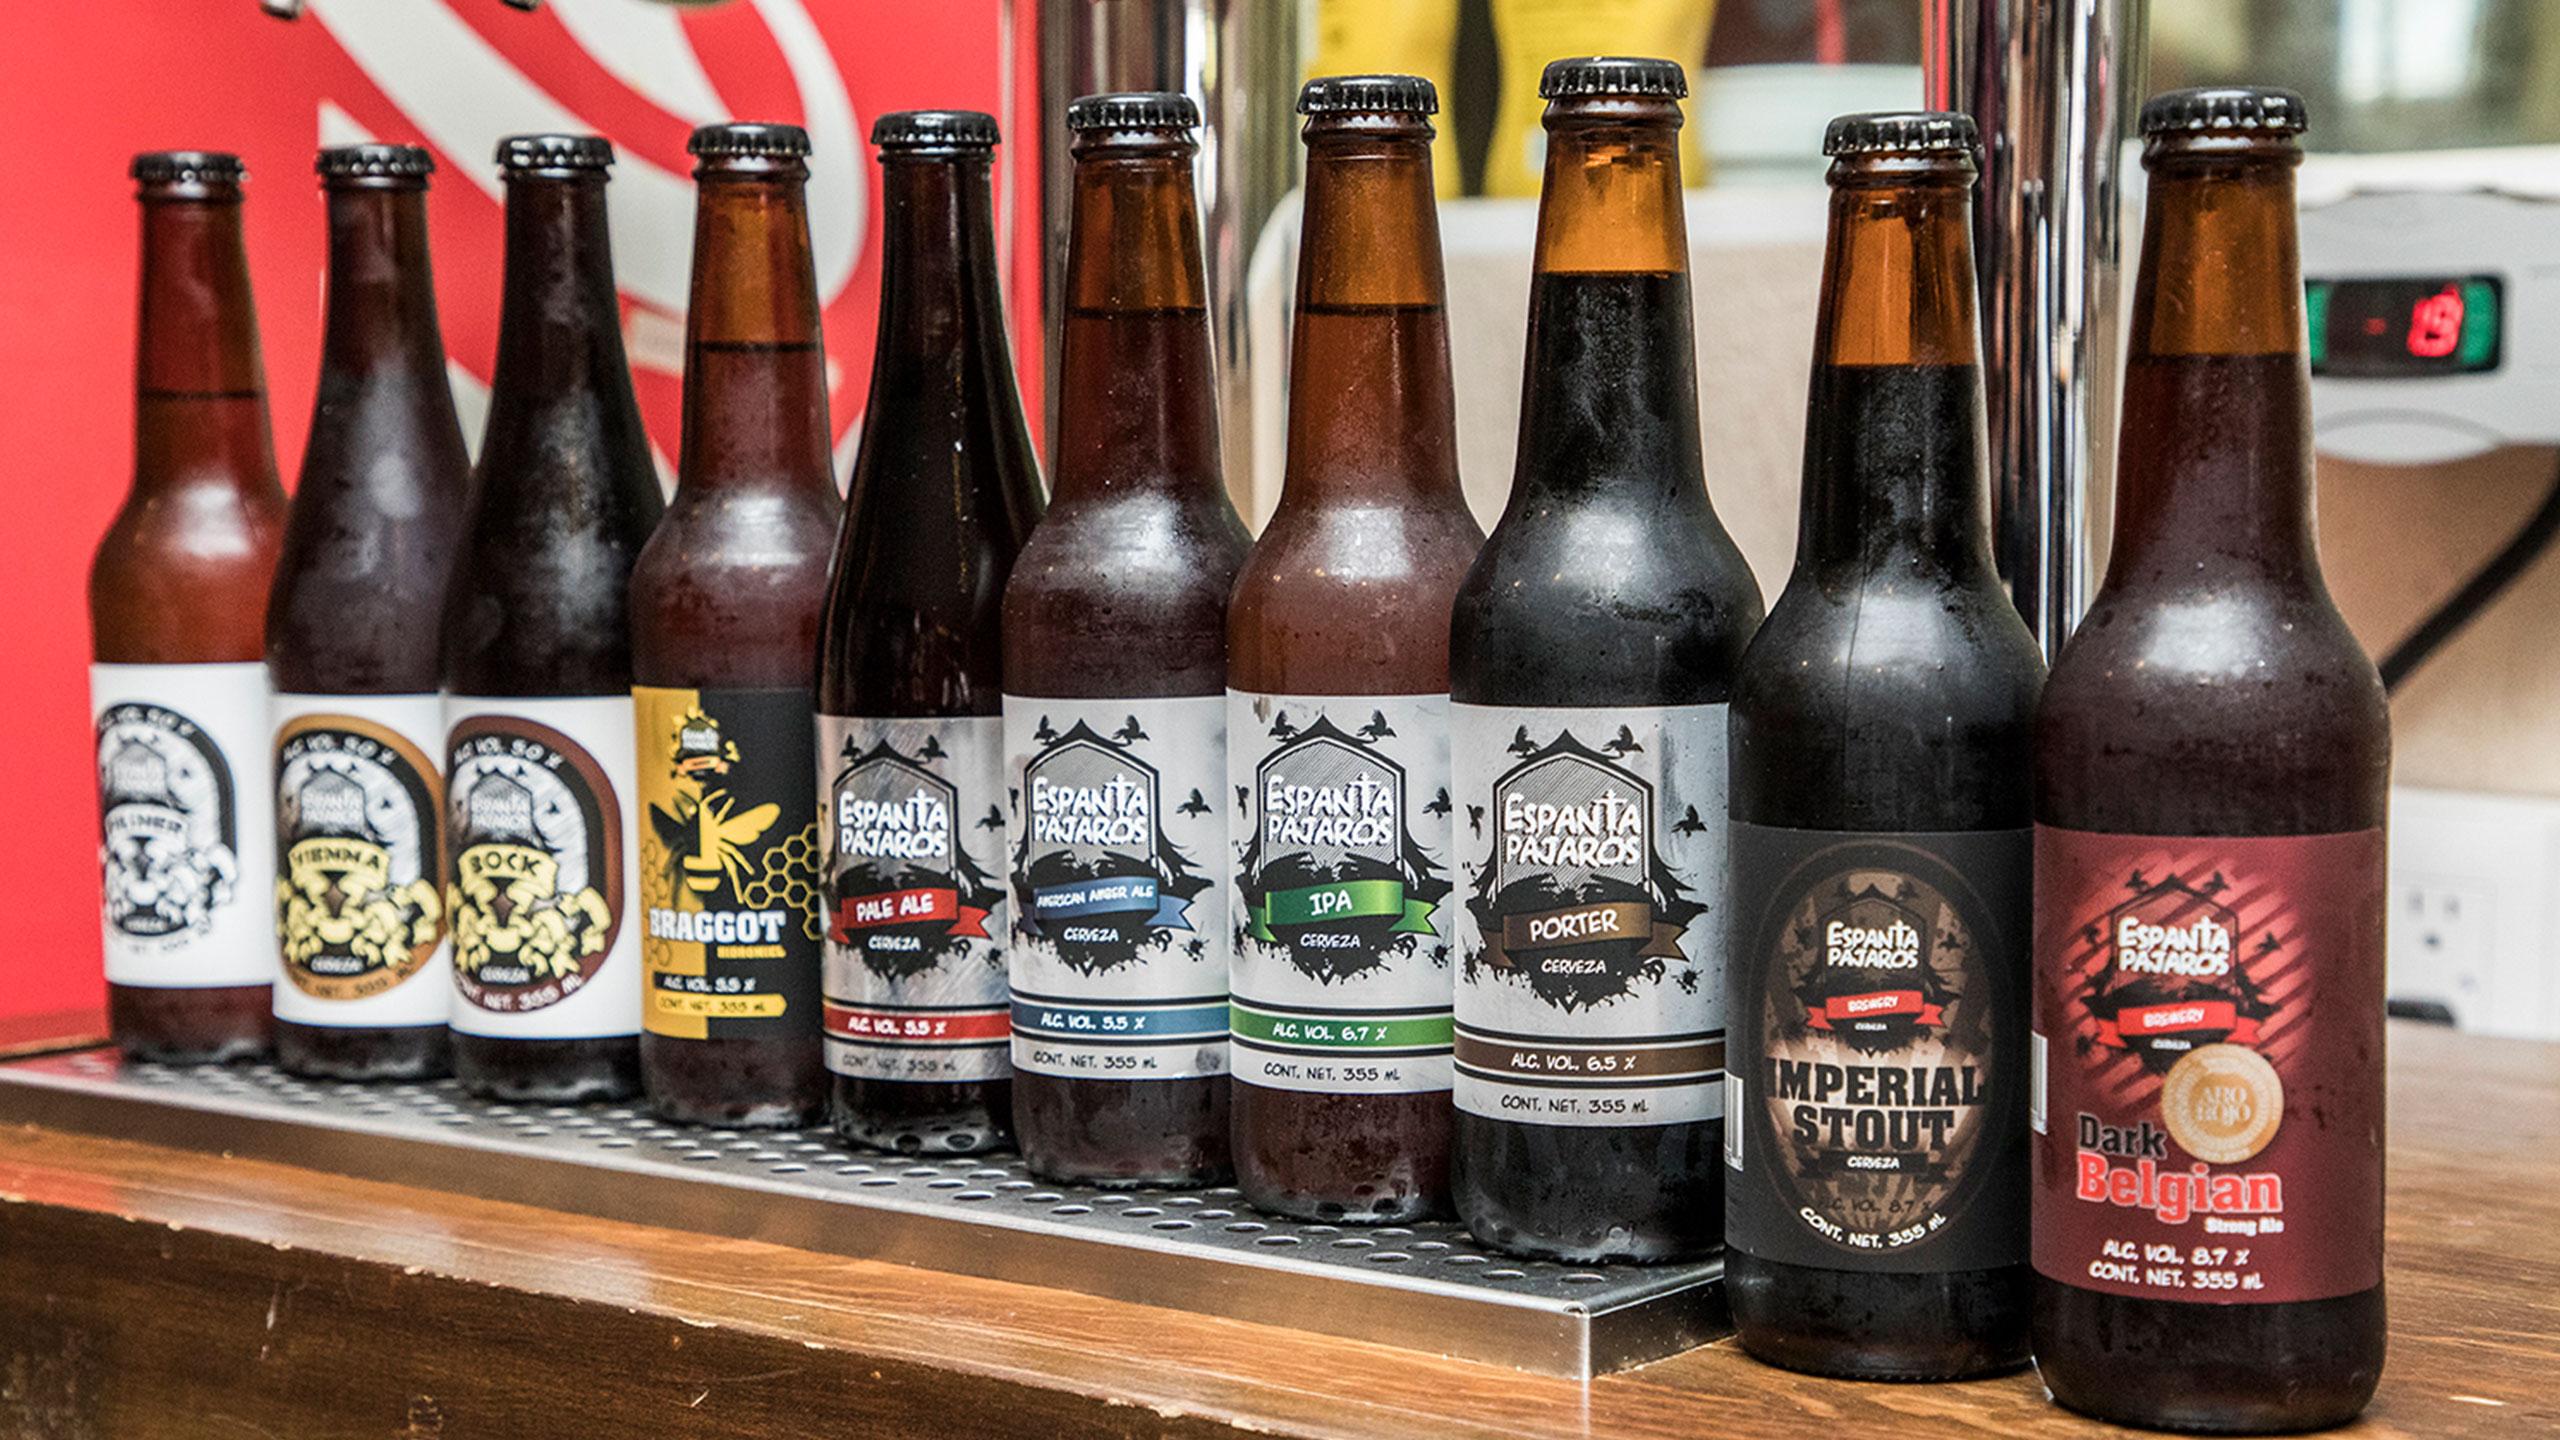 Barraca-Valenciana-cervezas